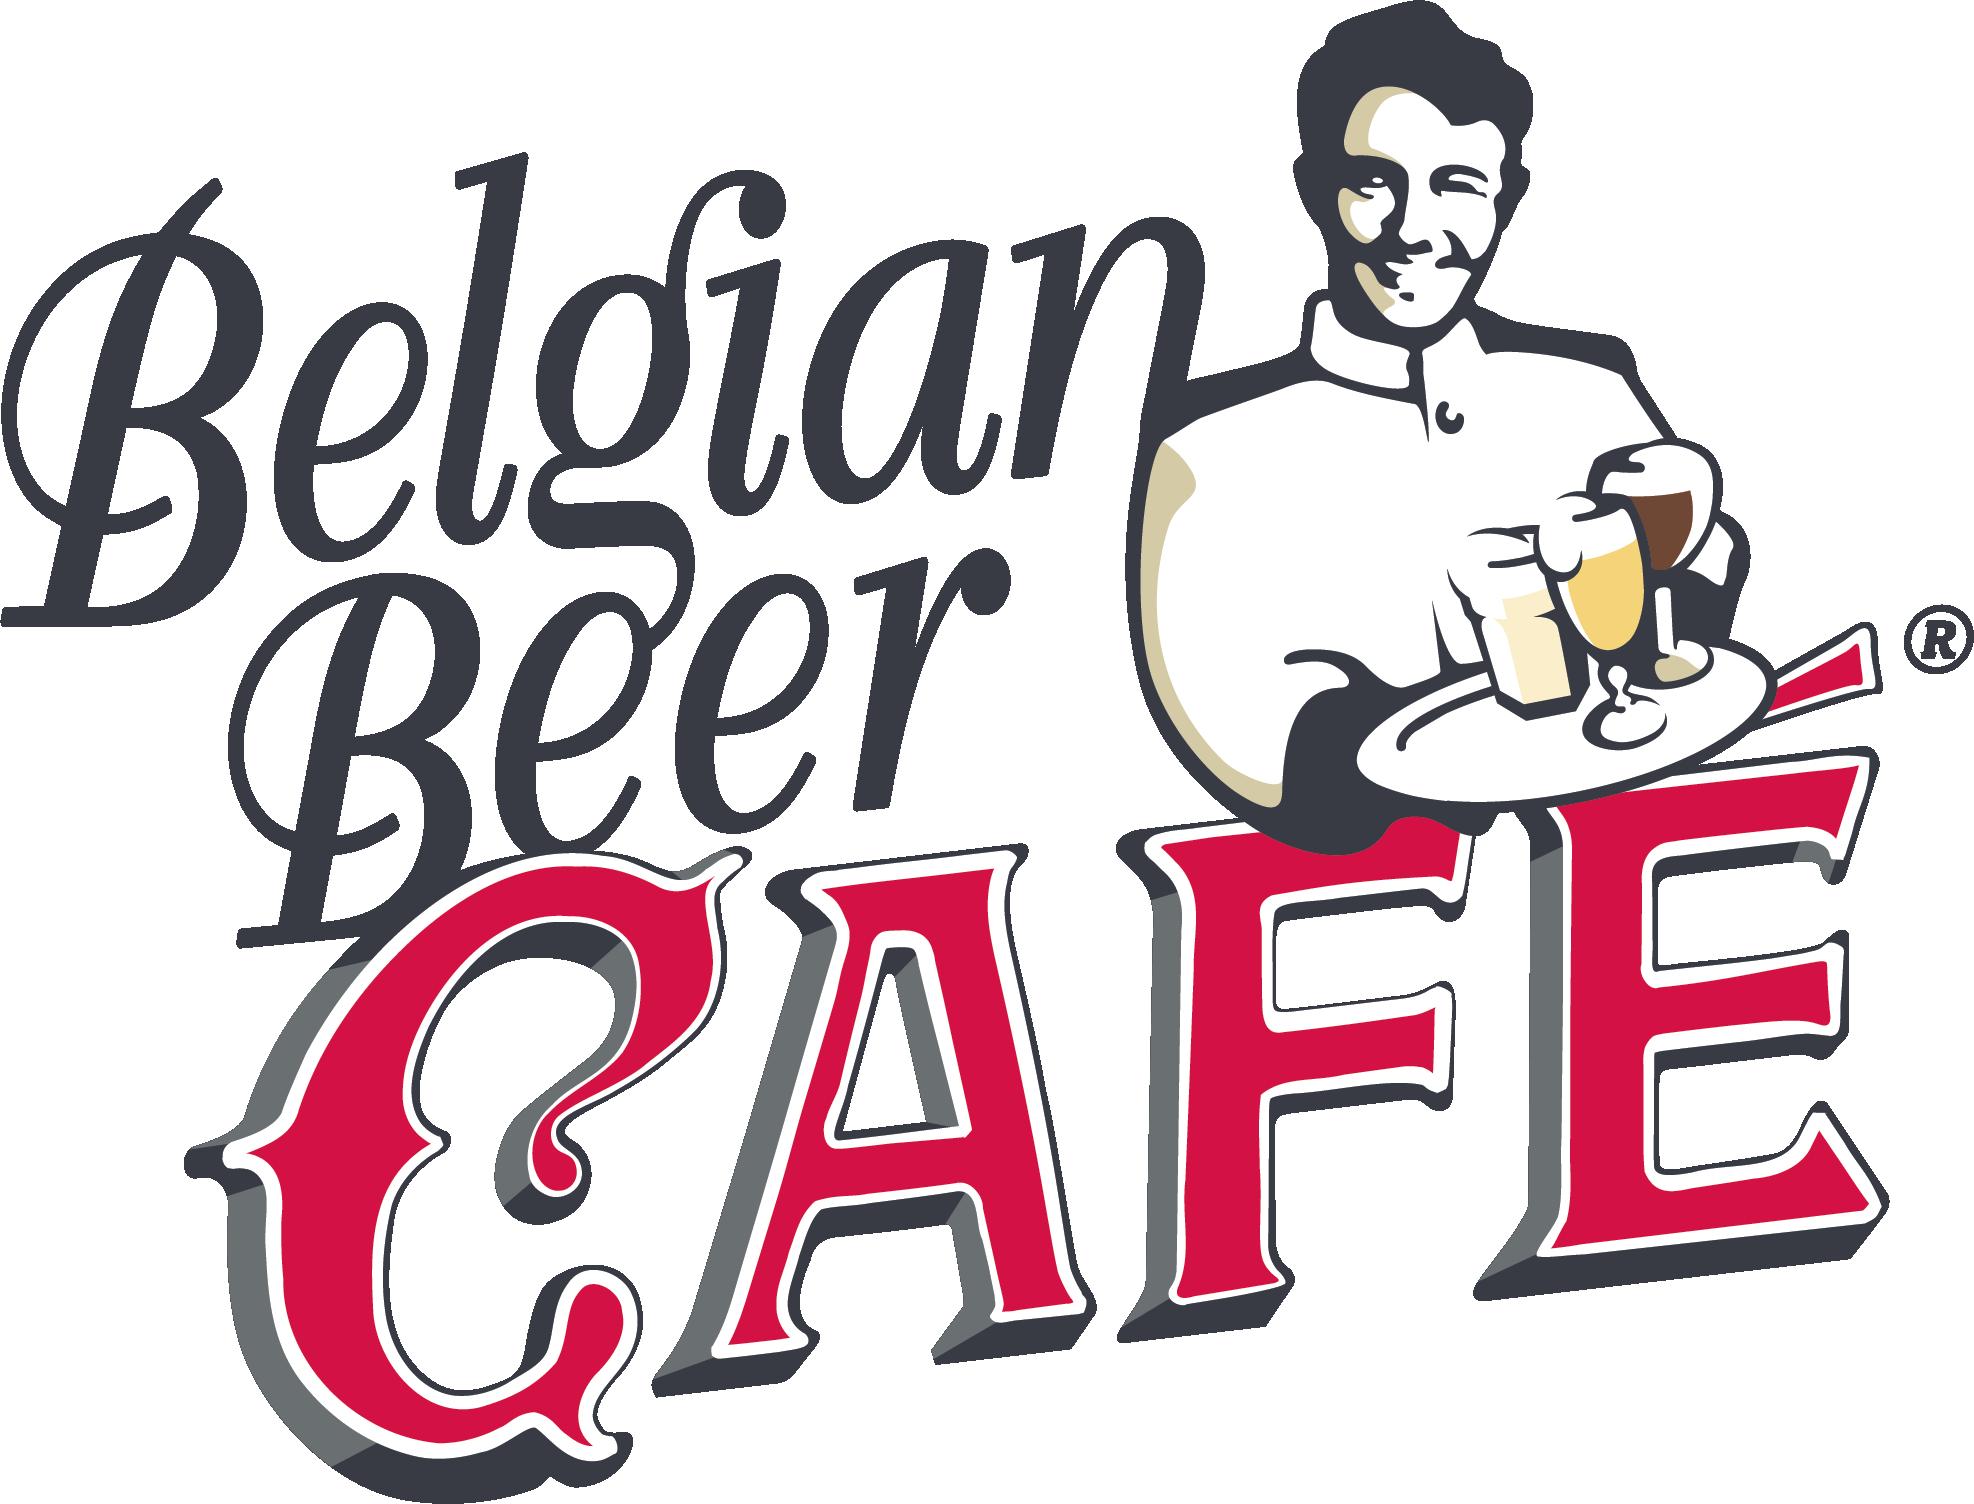 Creneau Interior Design Agency Dubai Middle East Franchise Belgian Beer Café